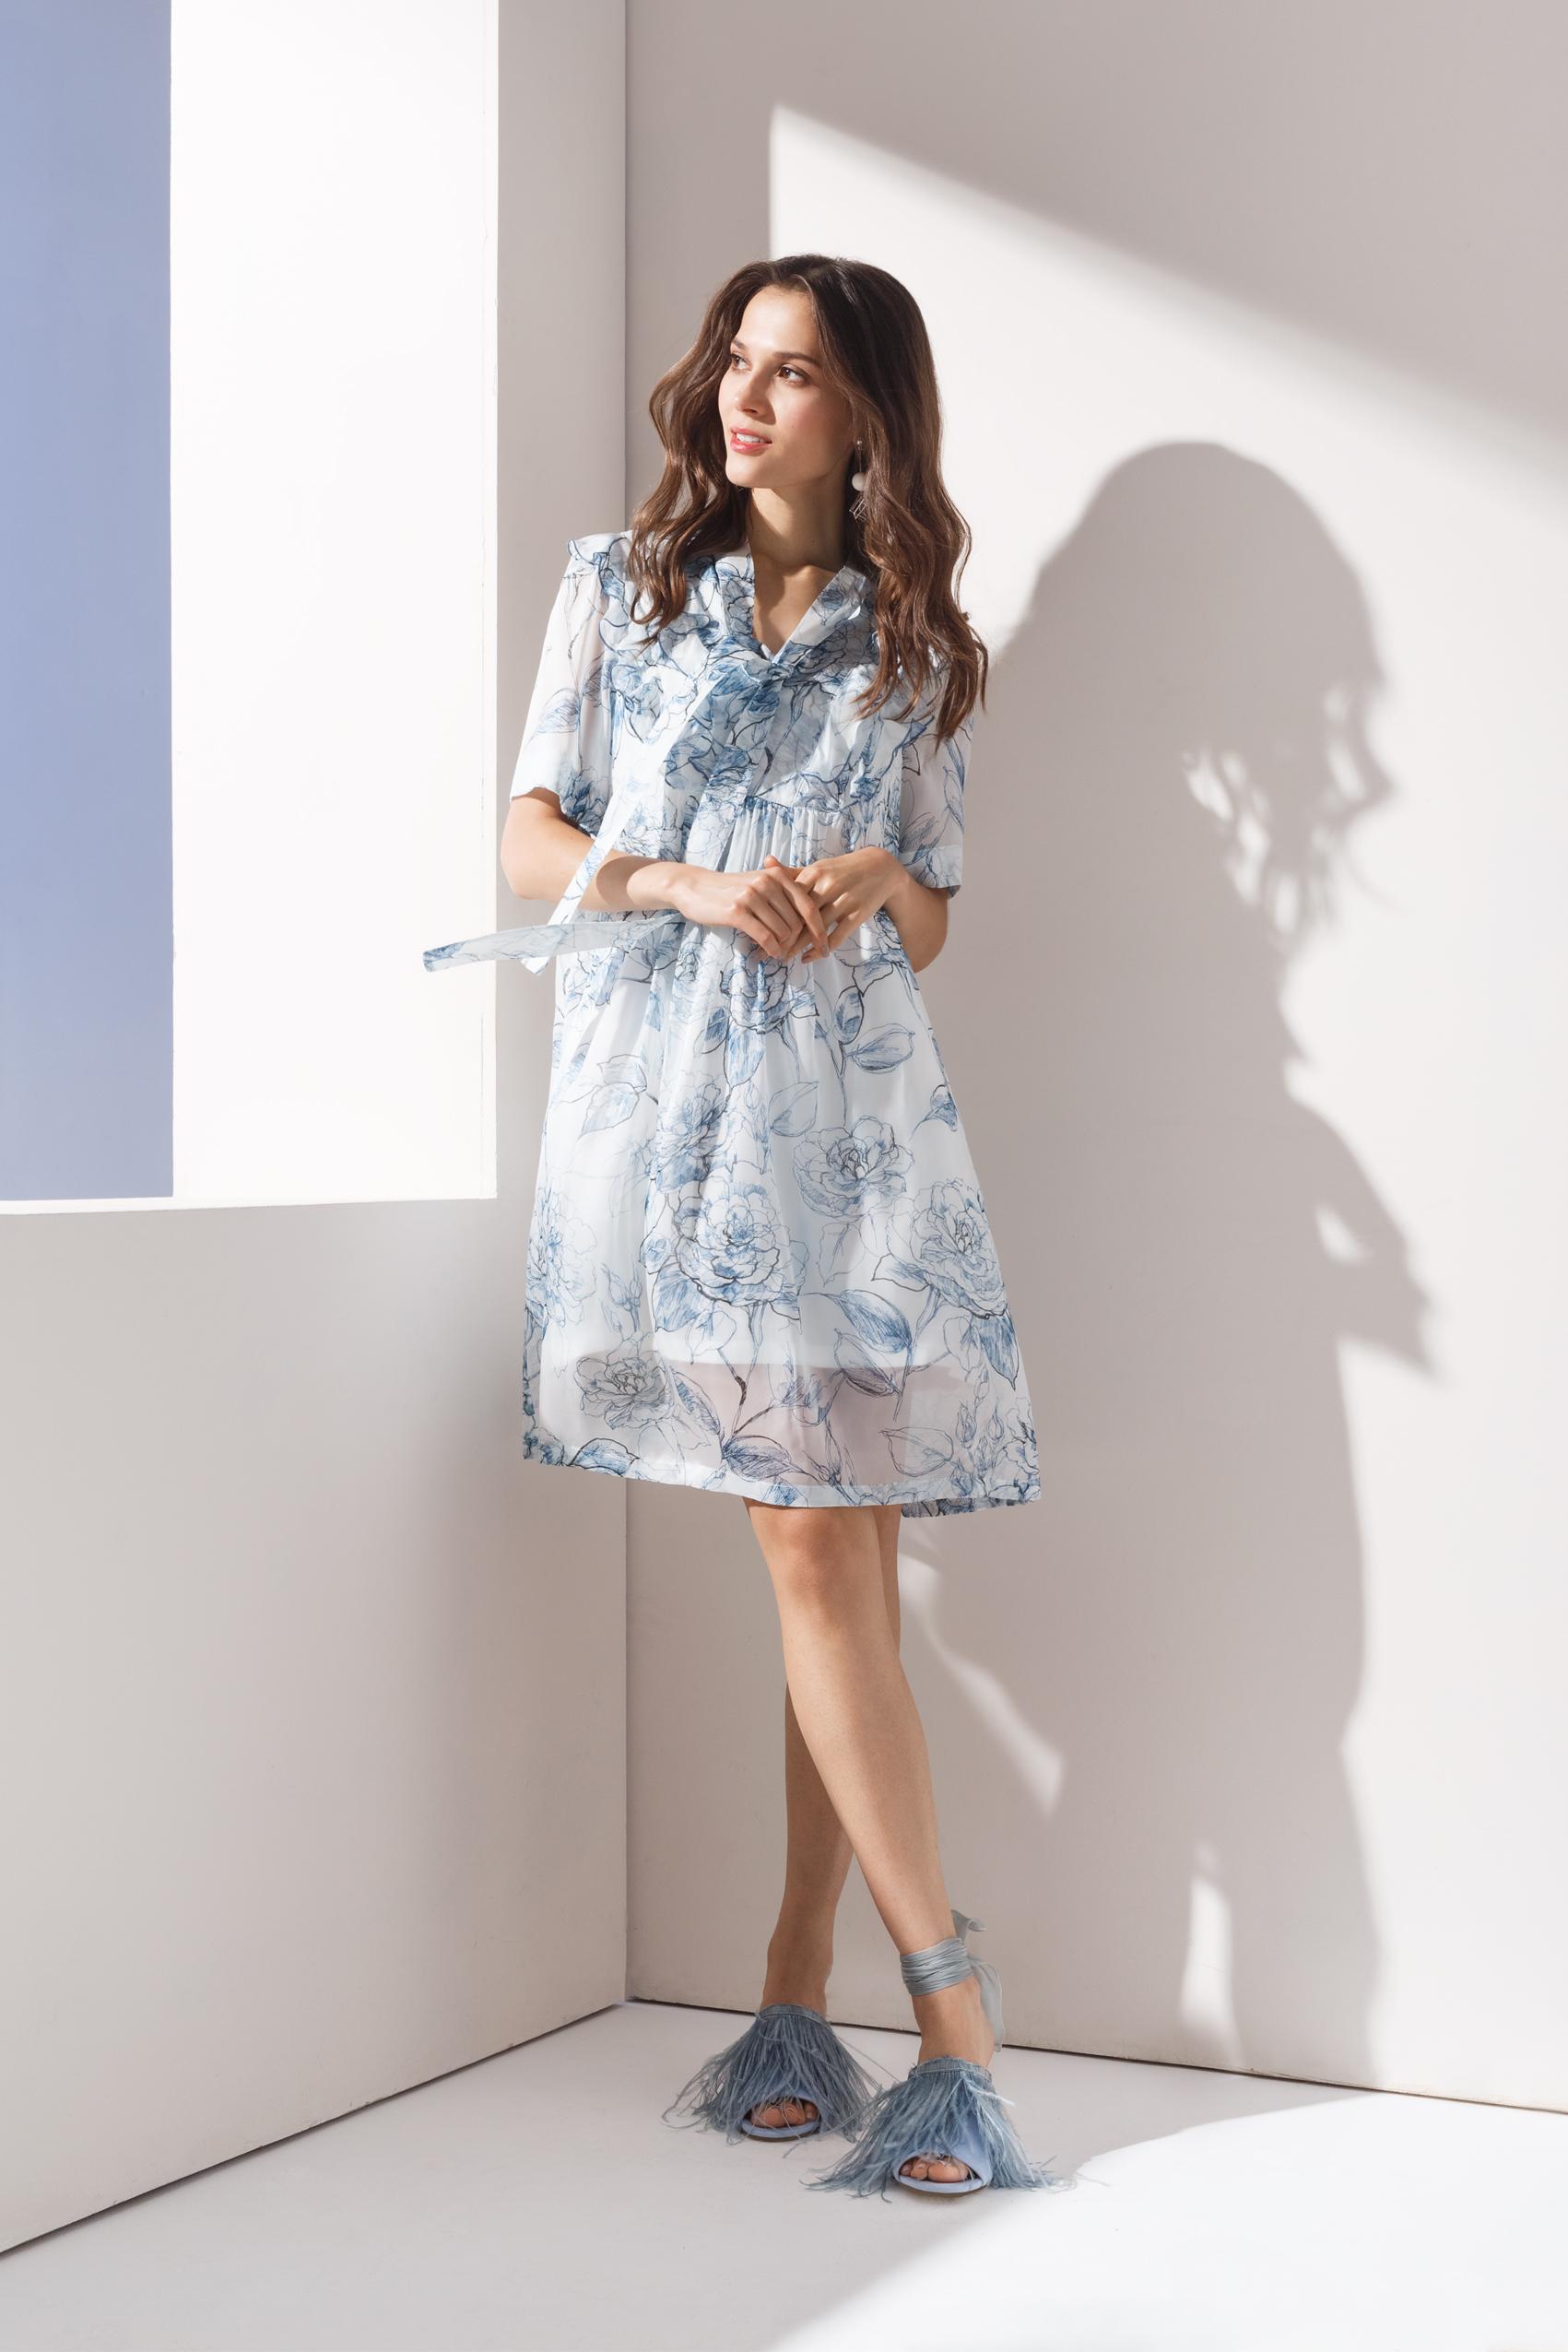 d85947a818a Платье на лето Летнее платье в СПБ ...